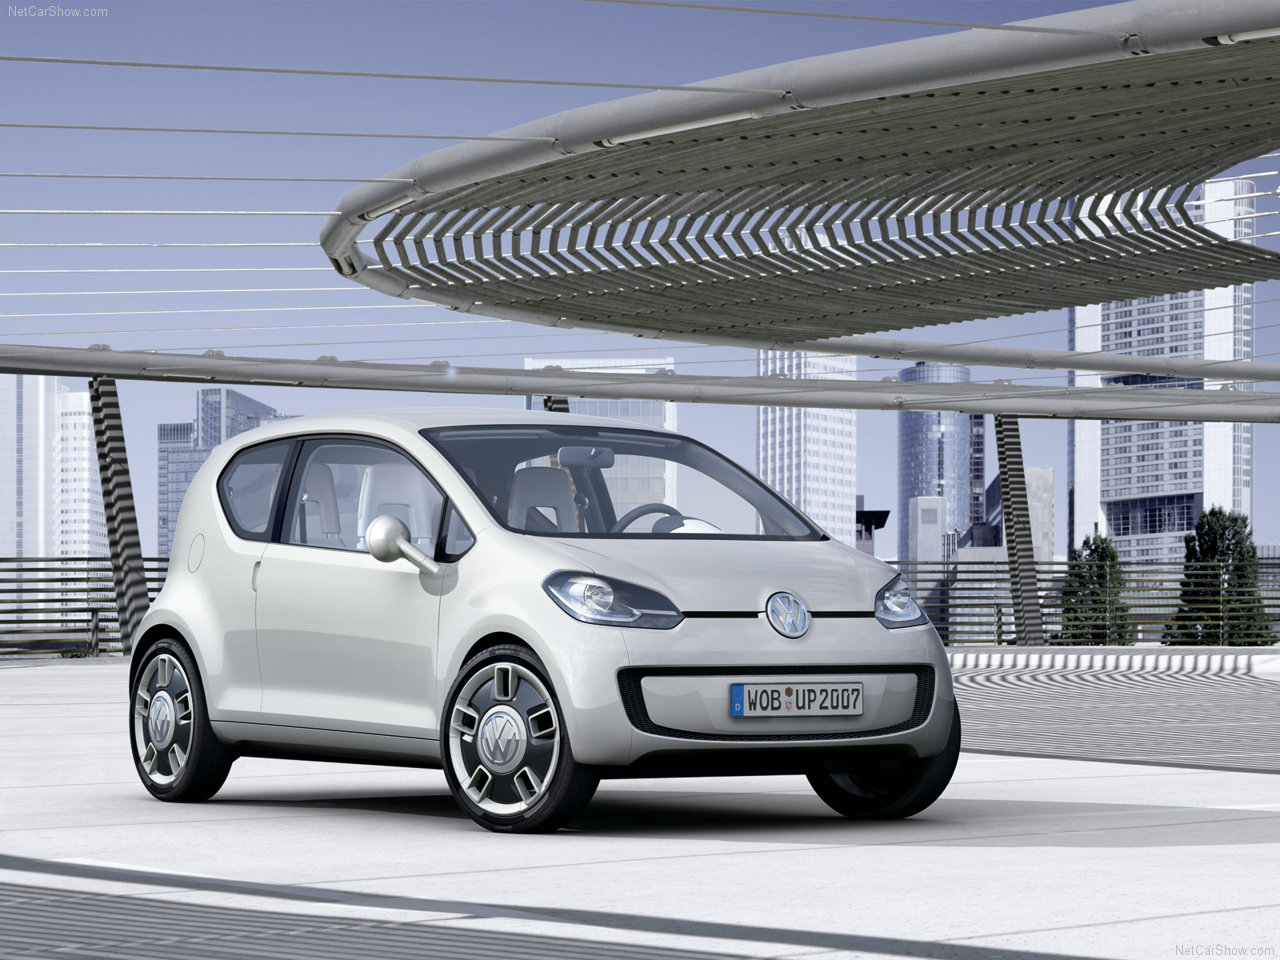 volkswagen   bluemotion hybrid technology europe car news latest cars hybrid